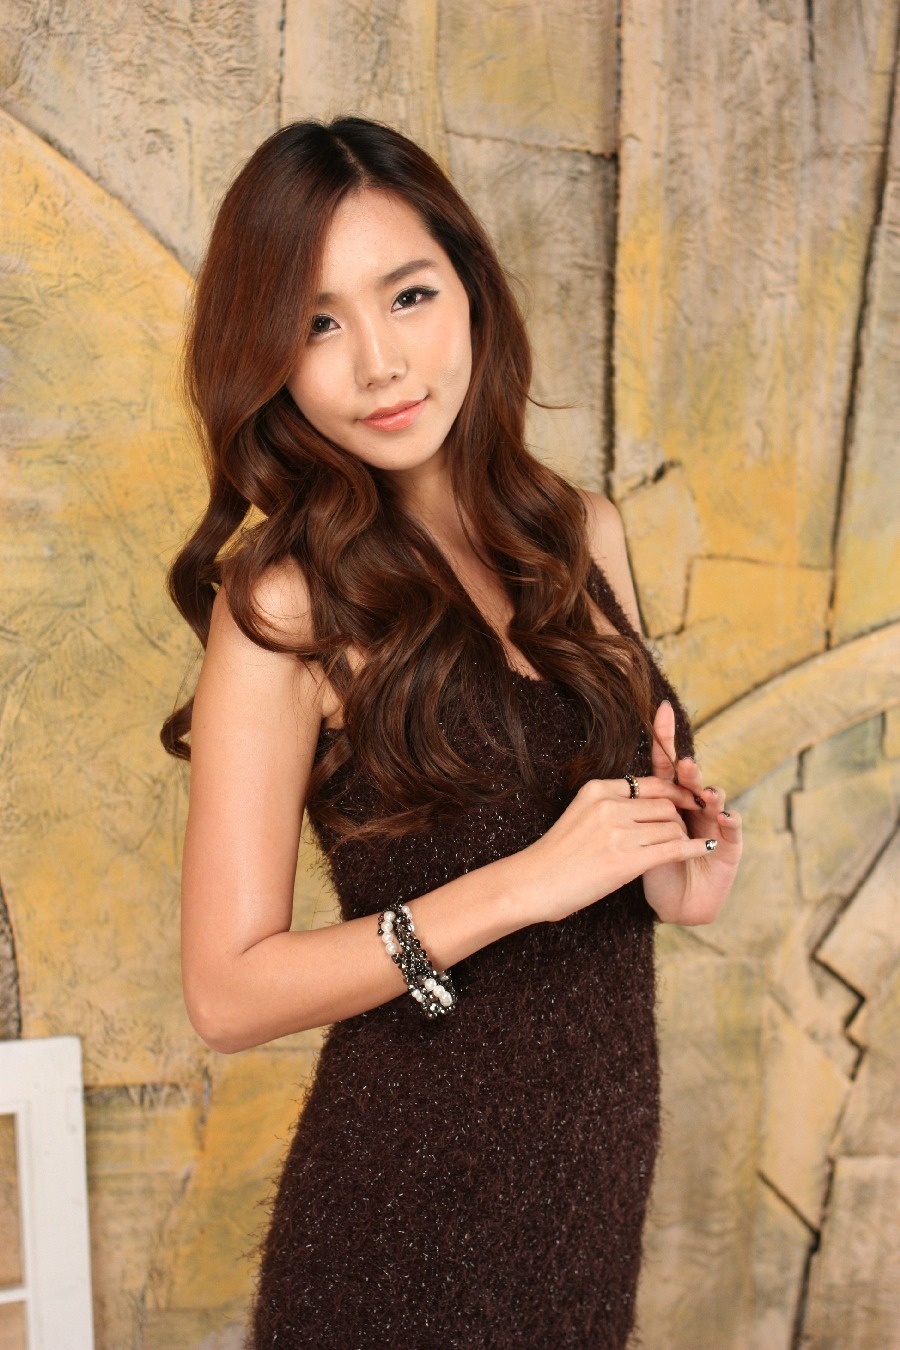 Korean Models Photos Gallery